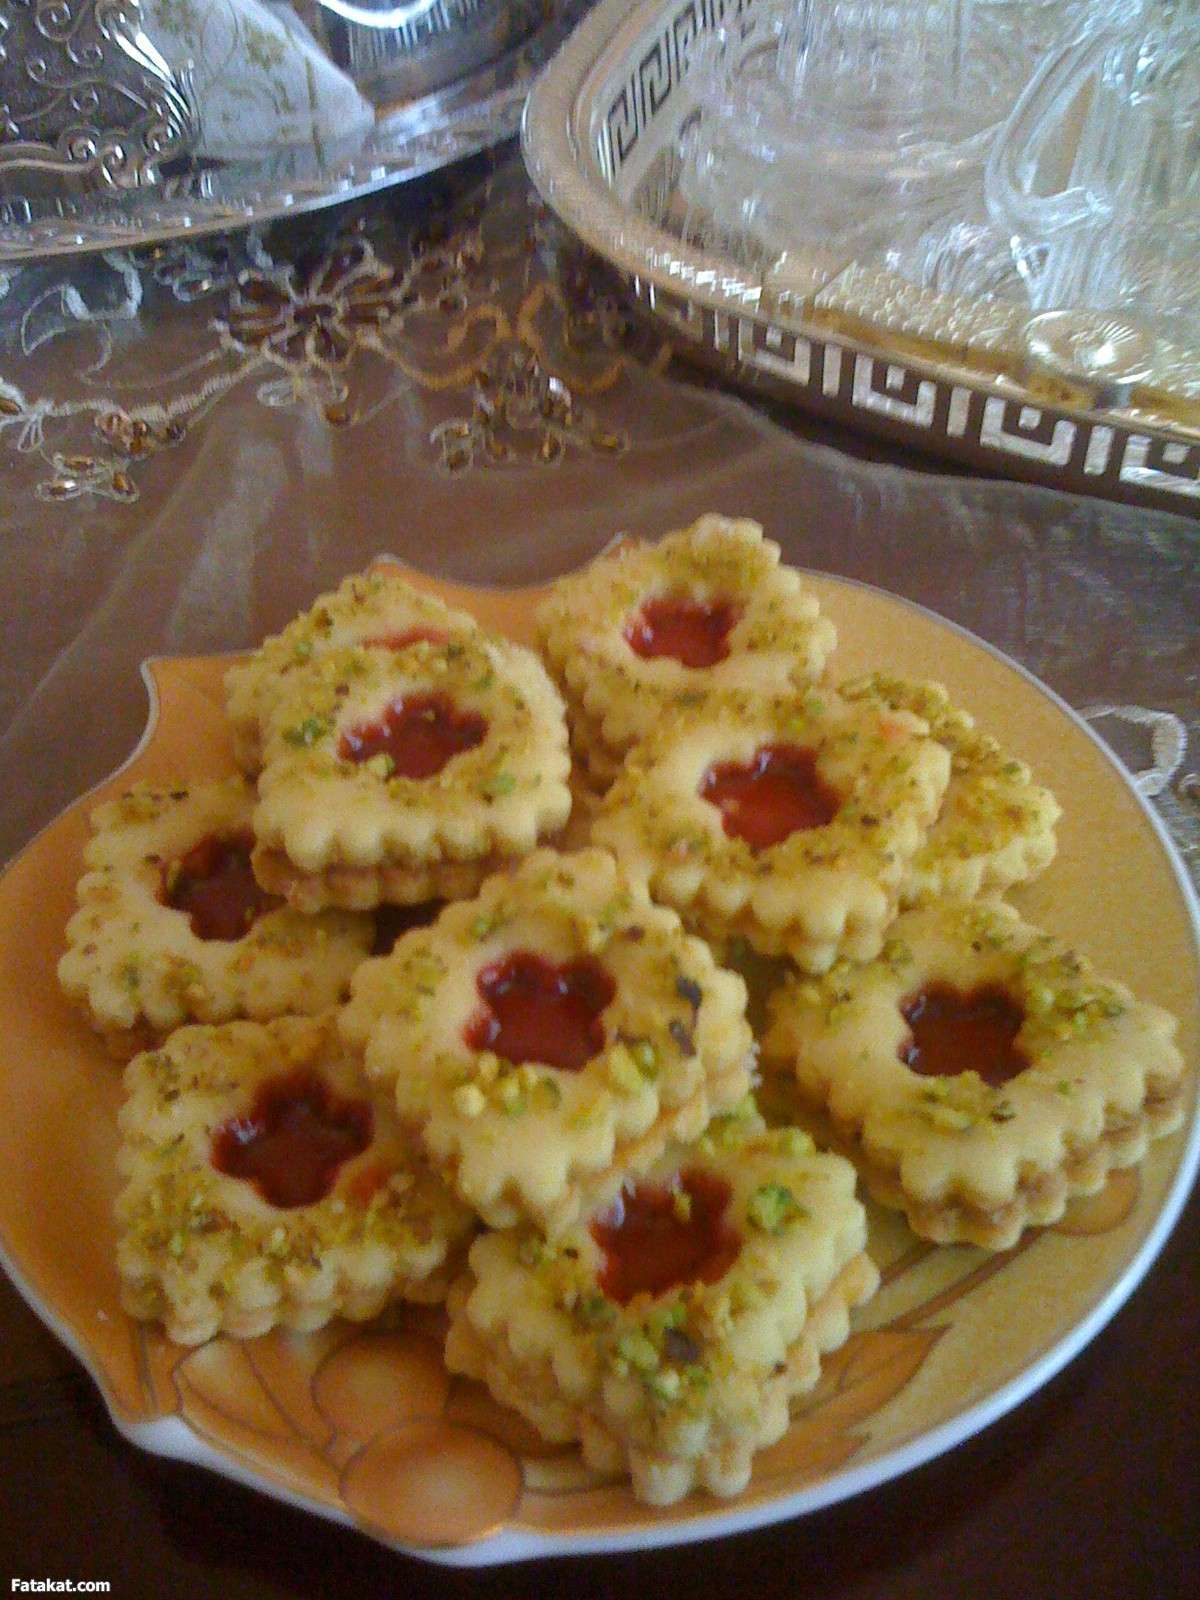 13454732112525 Jpg 1200 1600 Desserts Food Breakfast